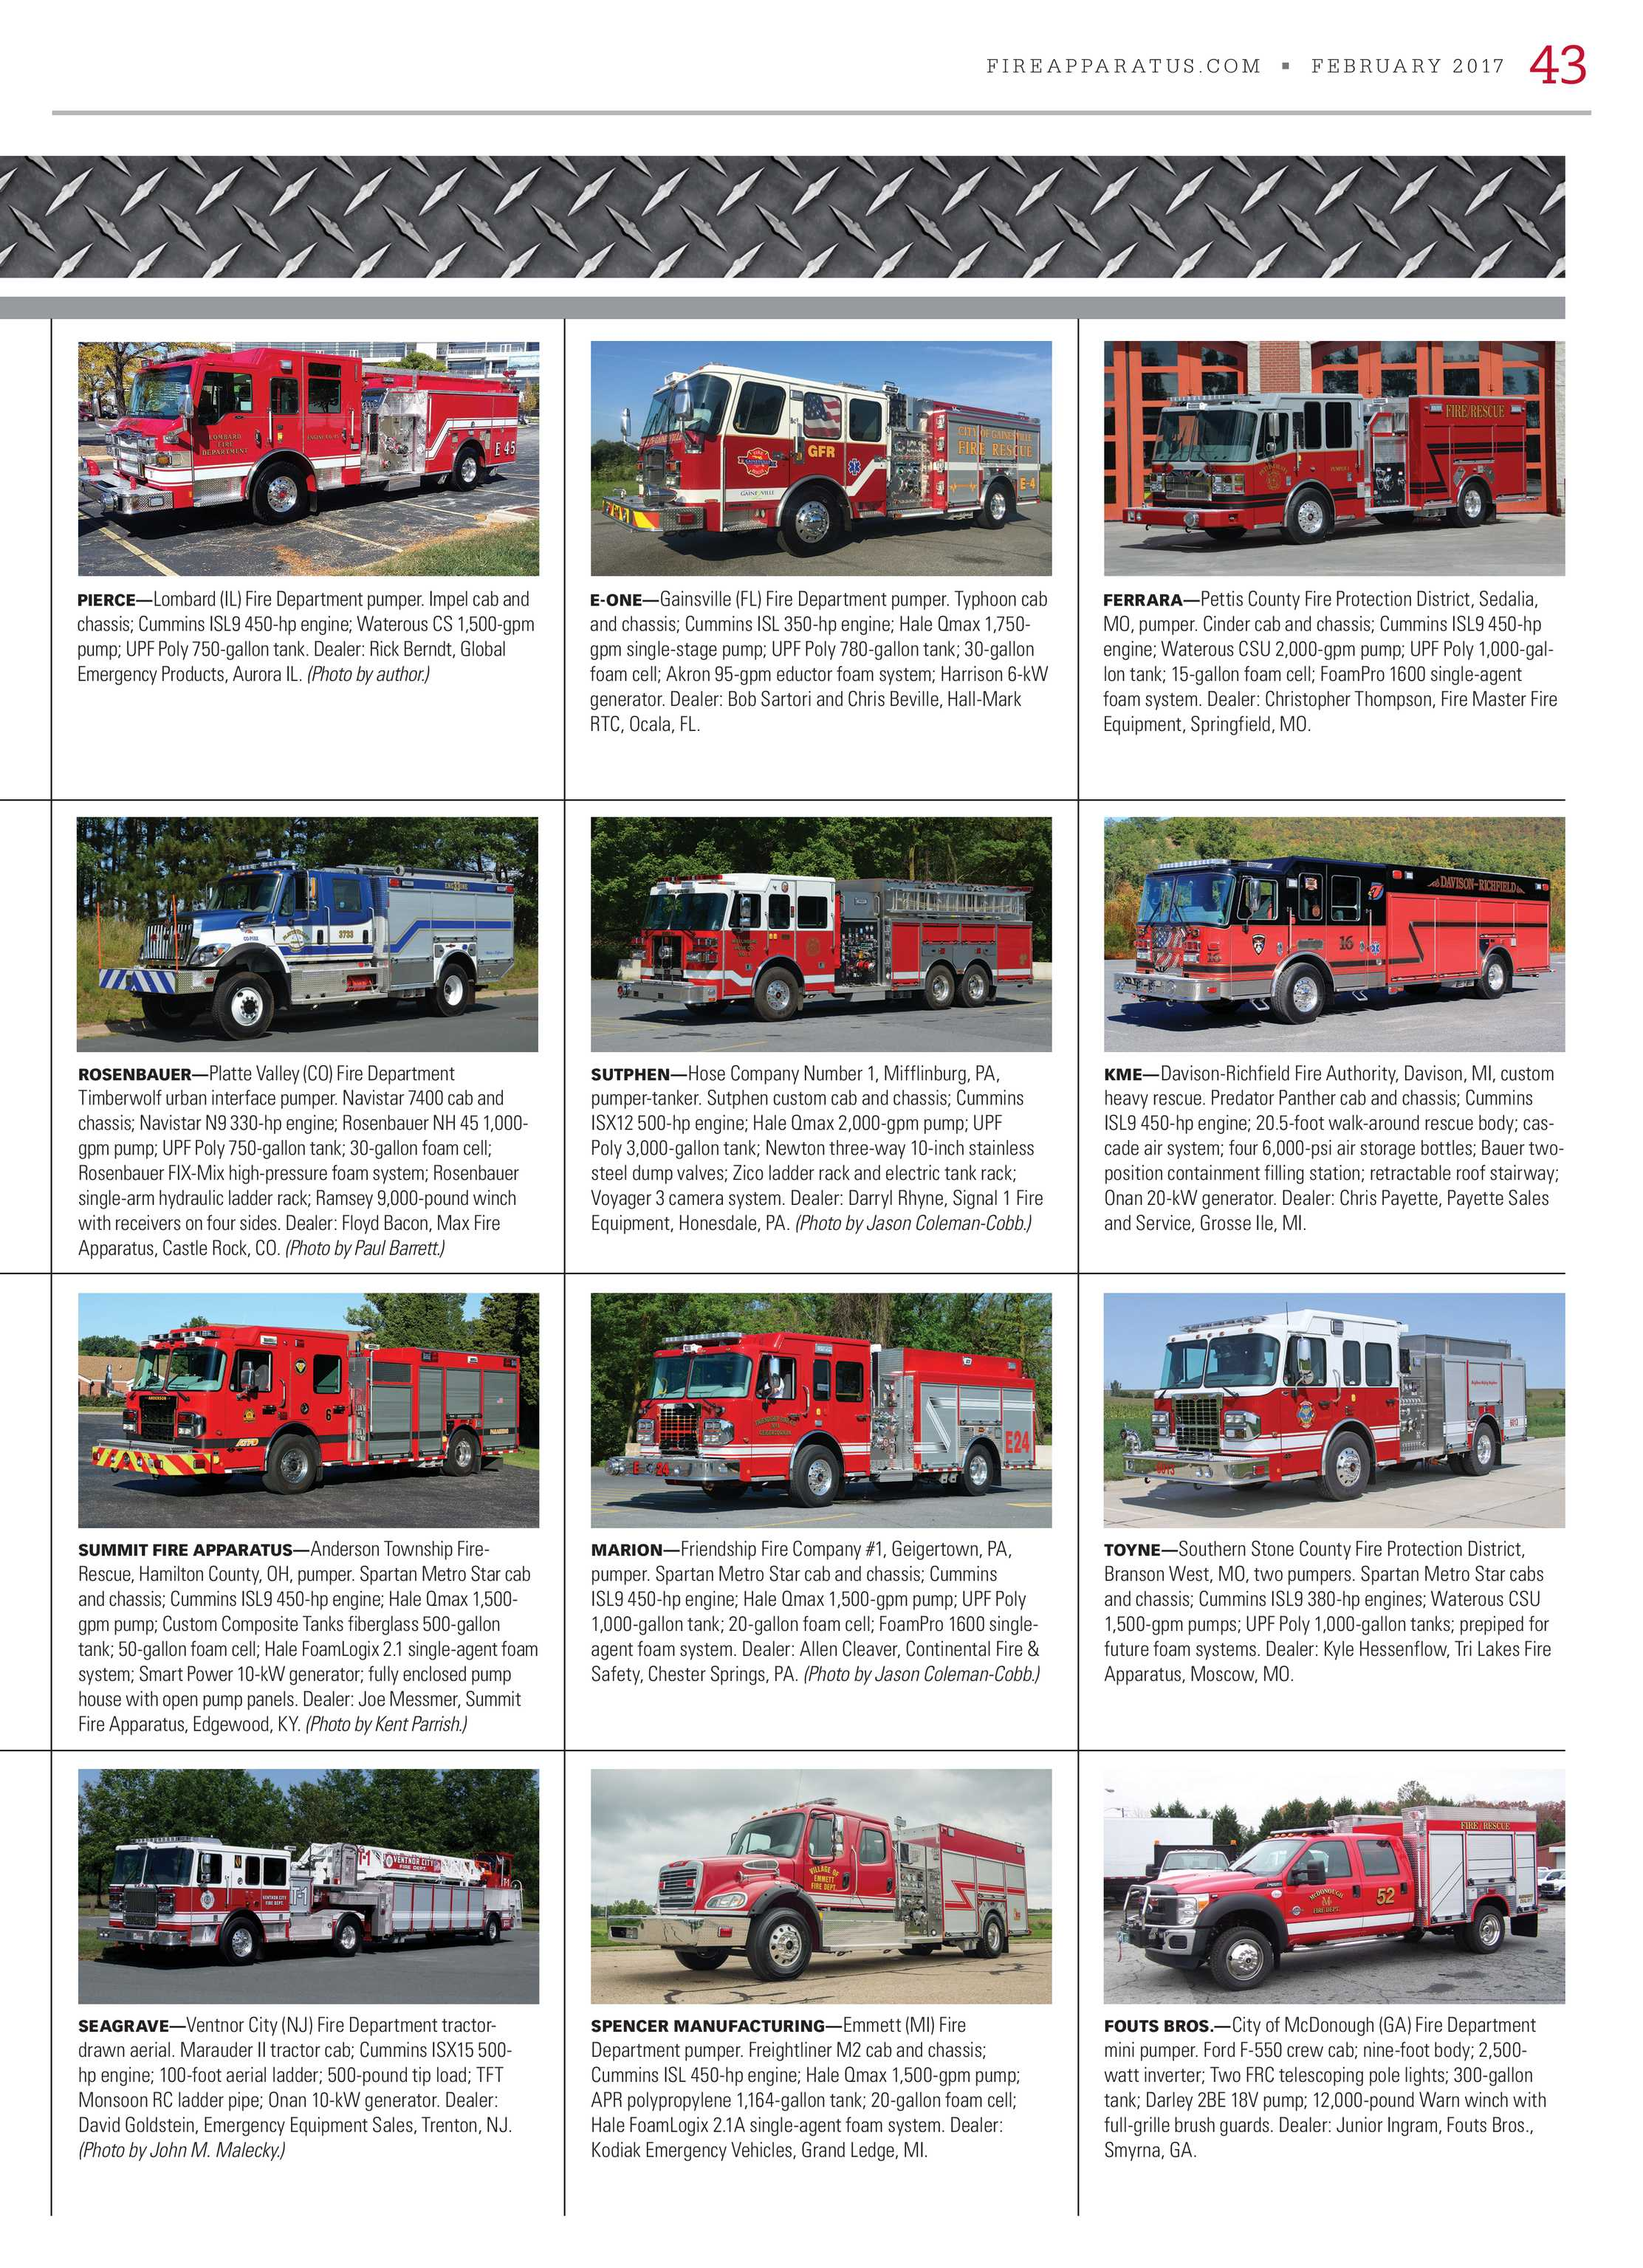 Fire Apparatus Magazine - February 2017 - page 43